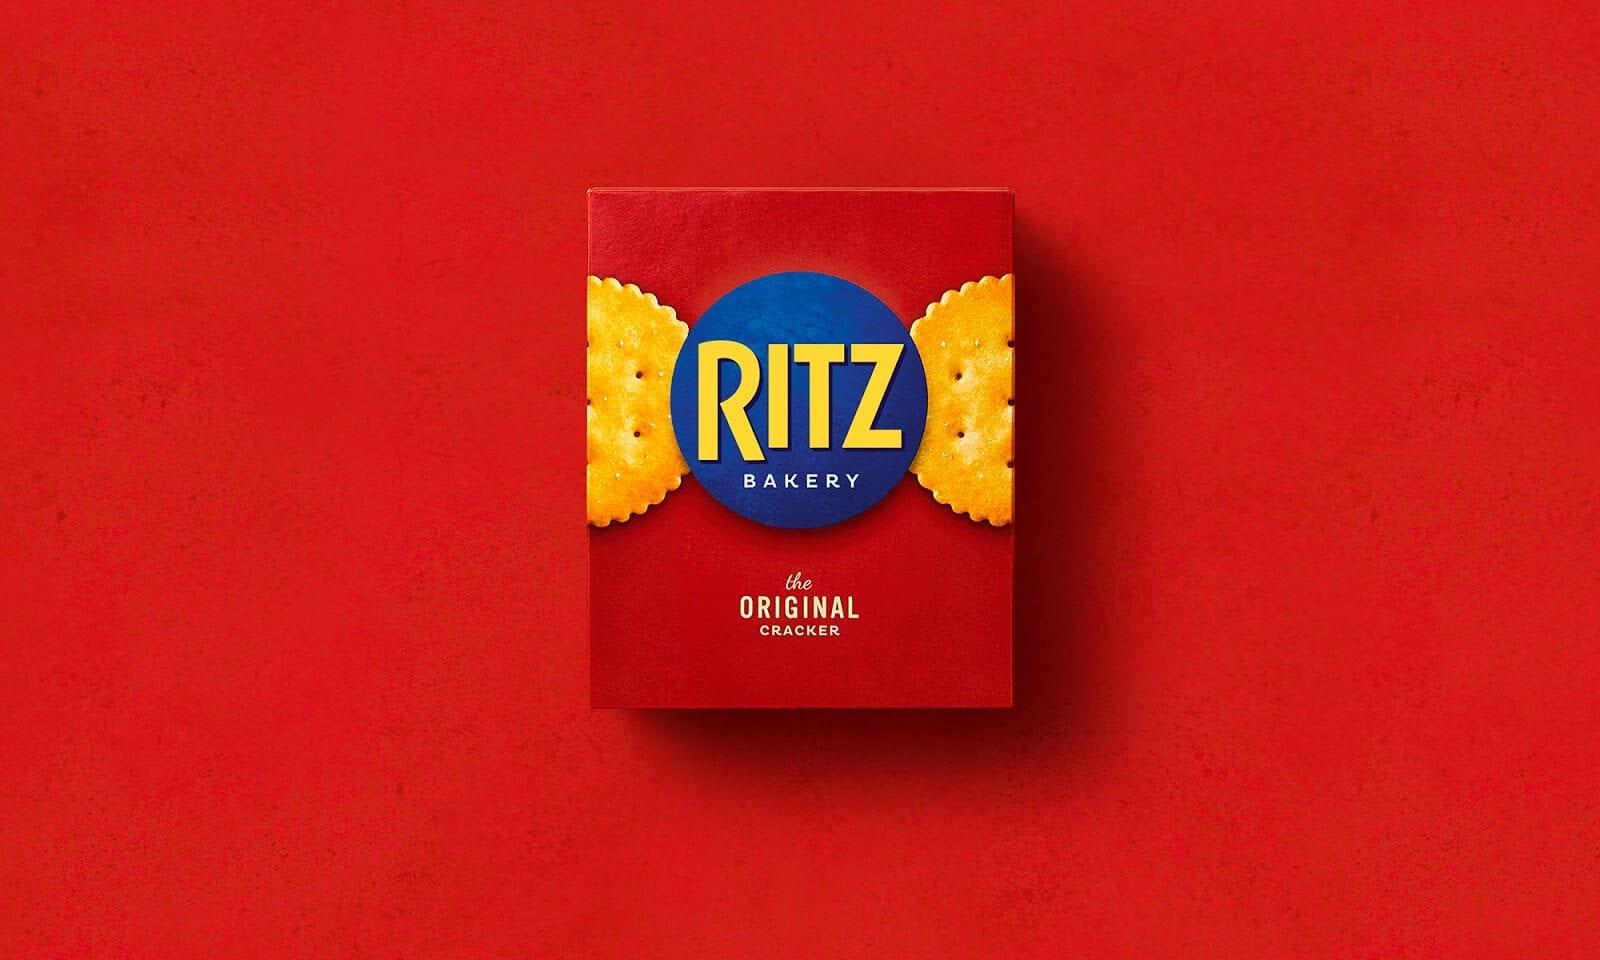 ritz family pr page 1 lowres - Nový redesign krekrů Ritz